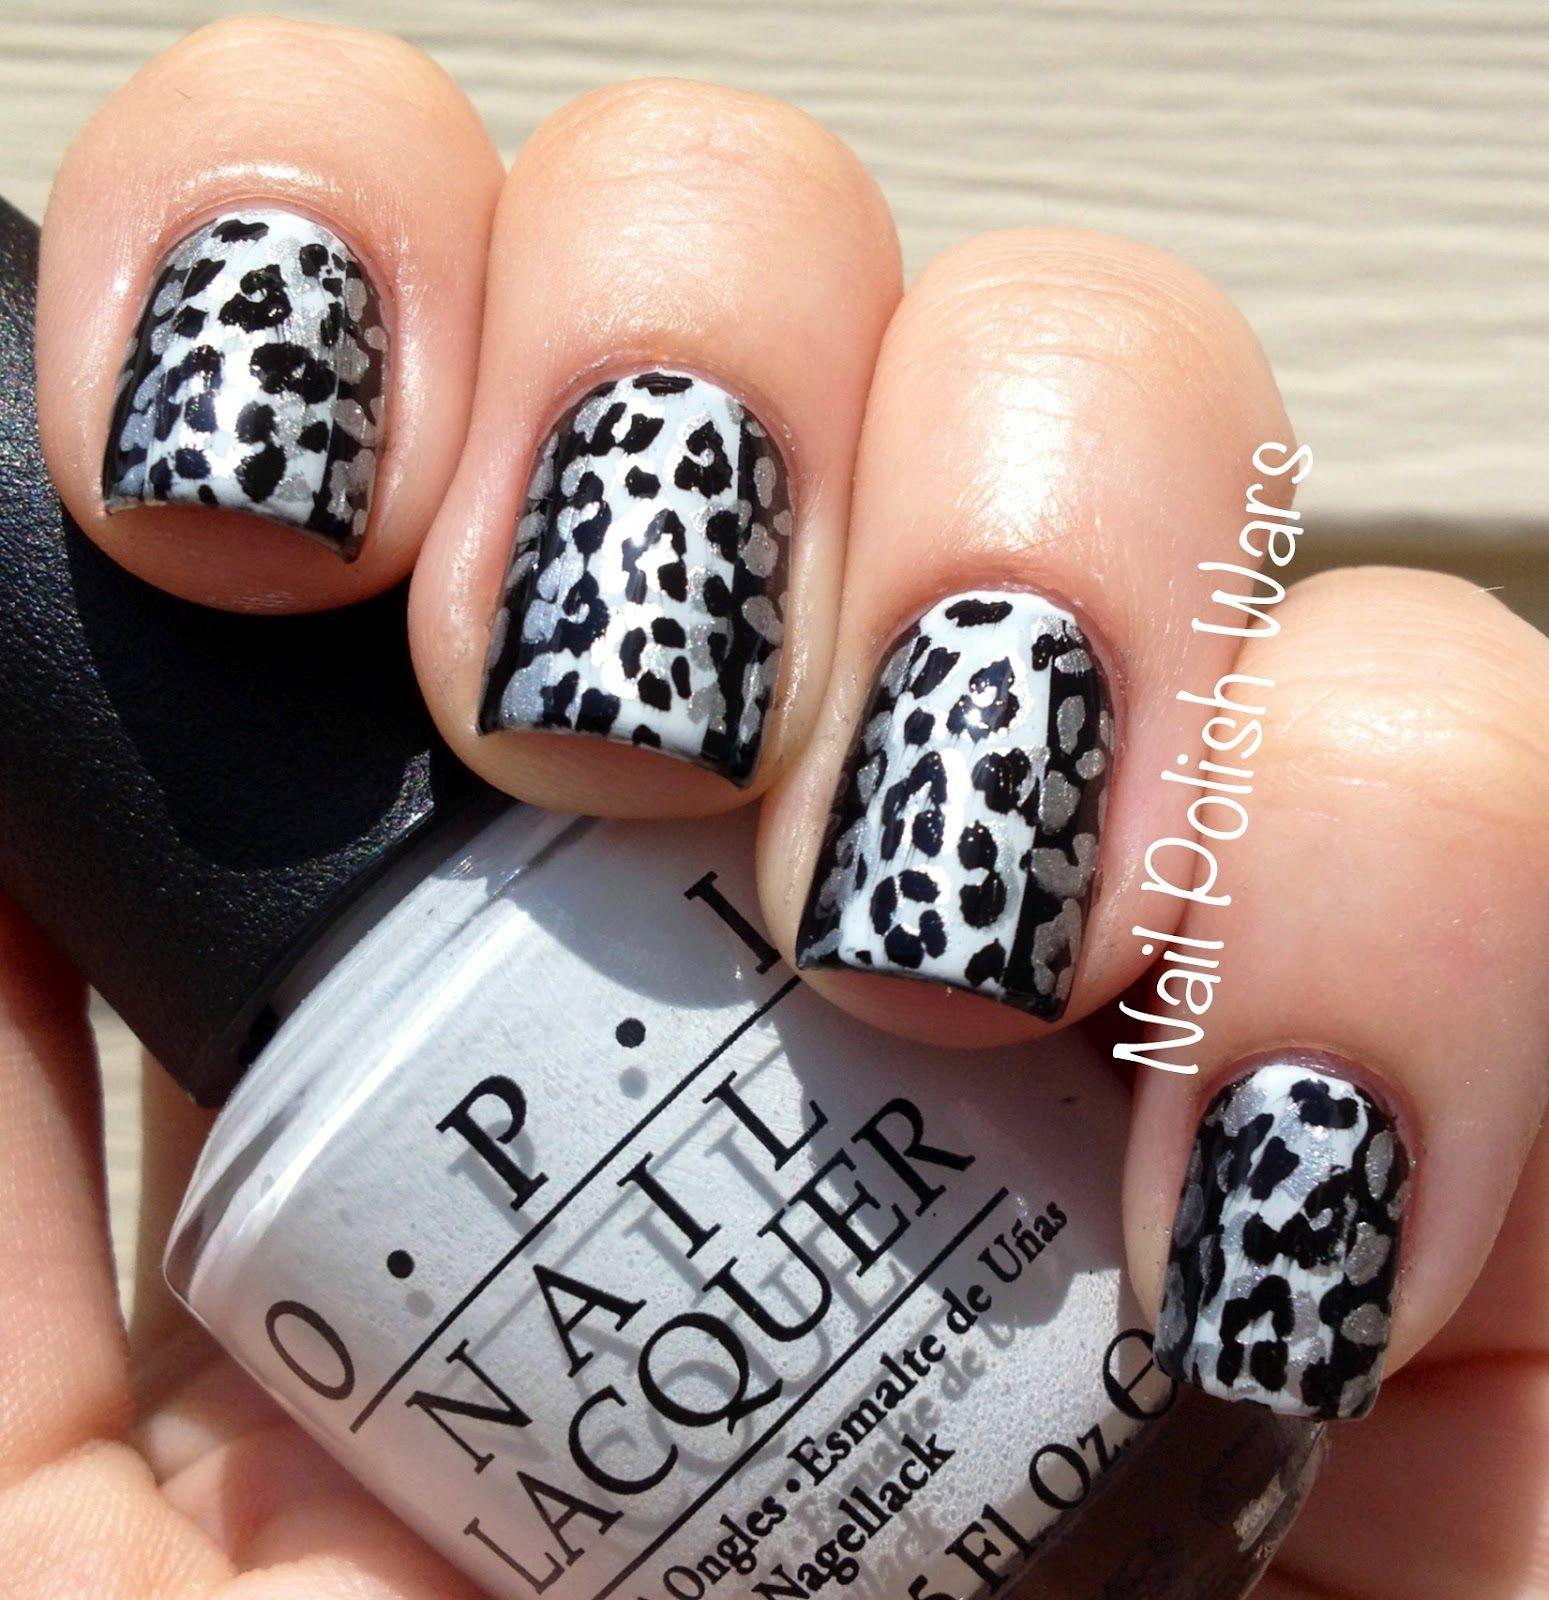 Diy Snow Leopard Nail Art: Nail Polish Wars: Lovely Leopard